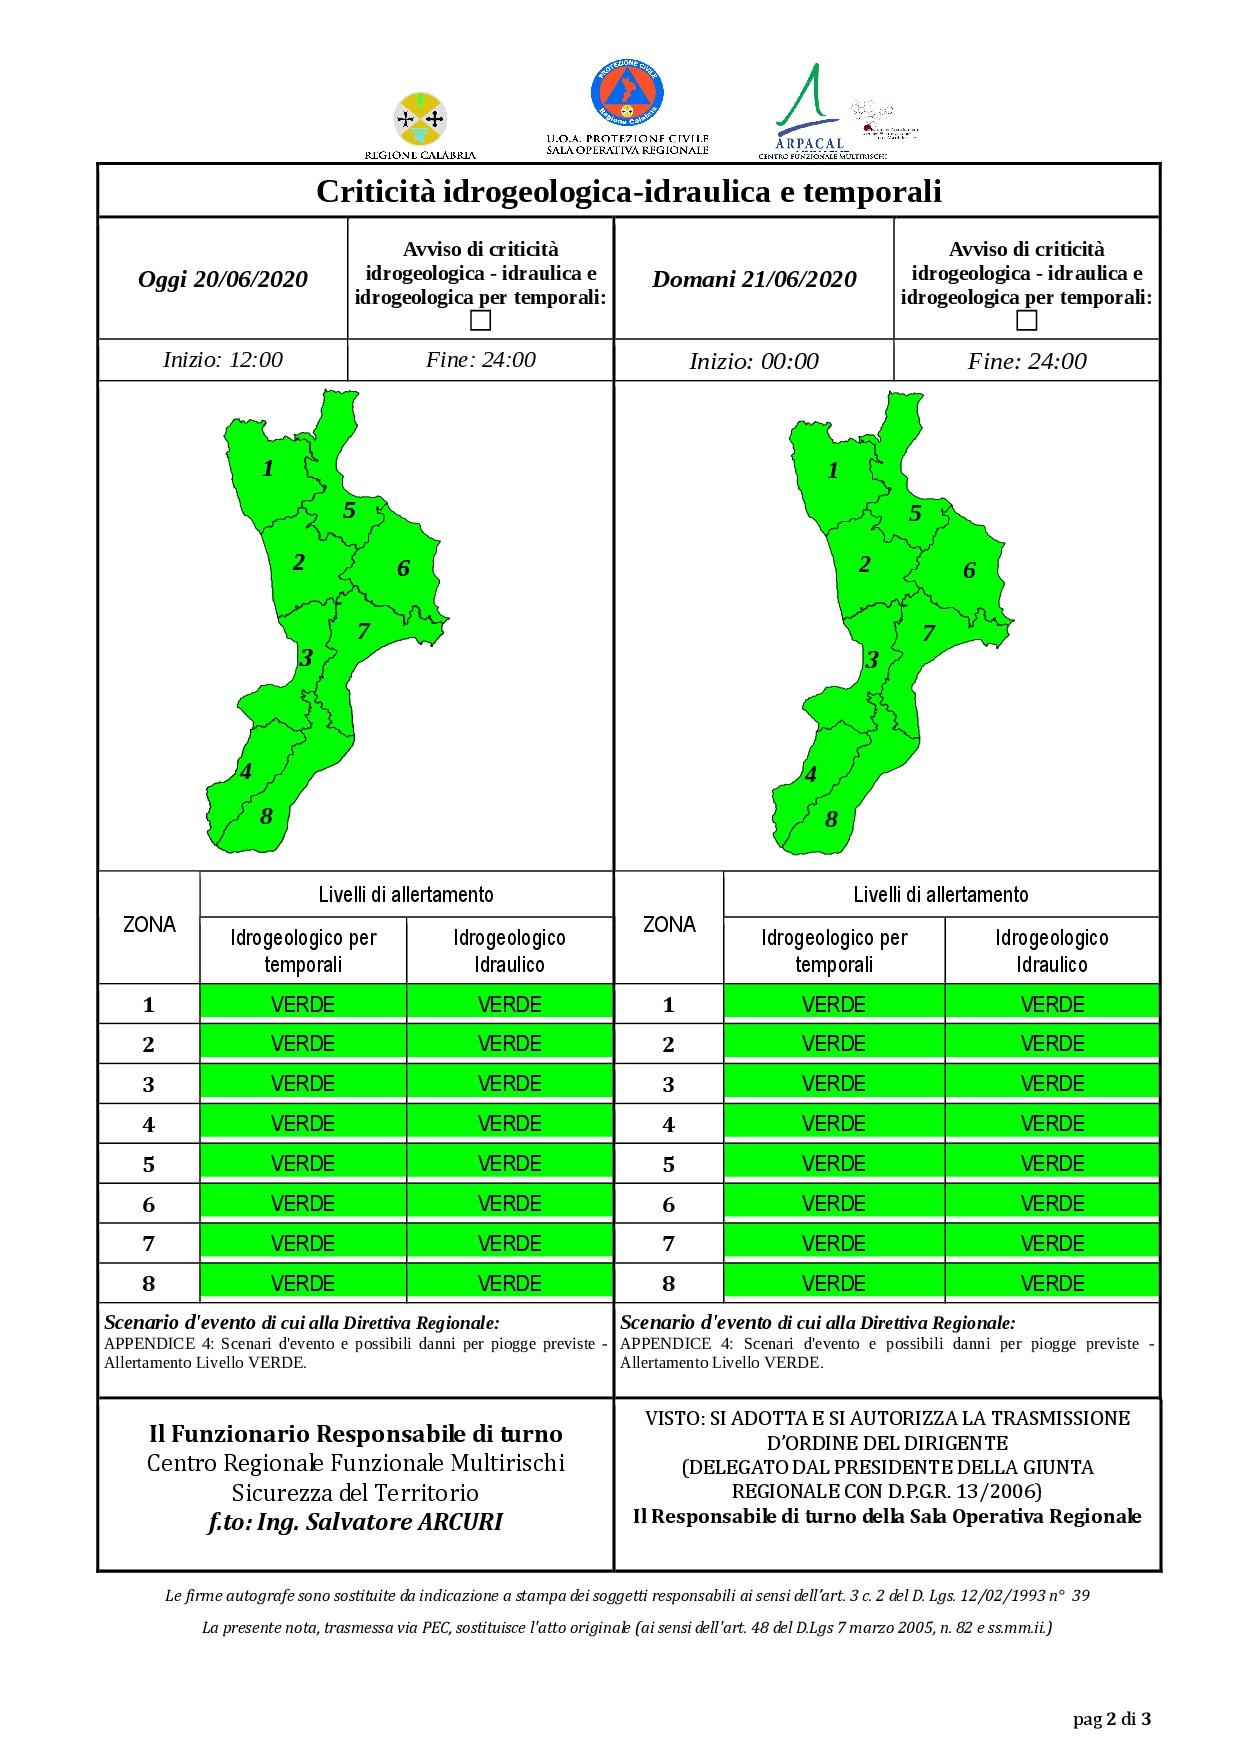 Criticità idrogeologica-idraulica e temporali in Calabria 20-06-2020